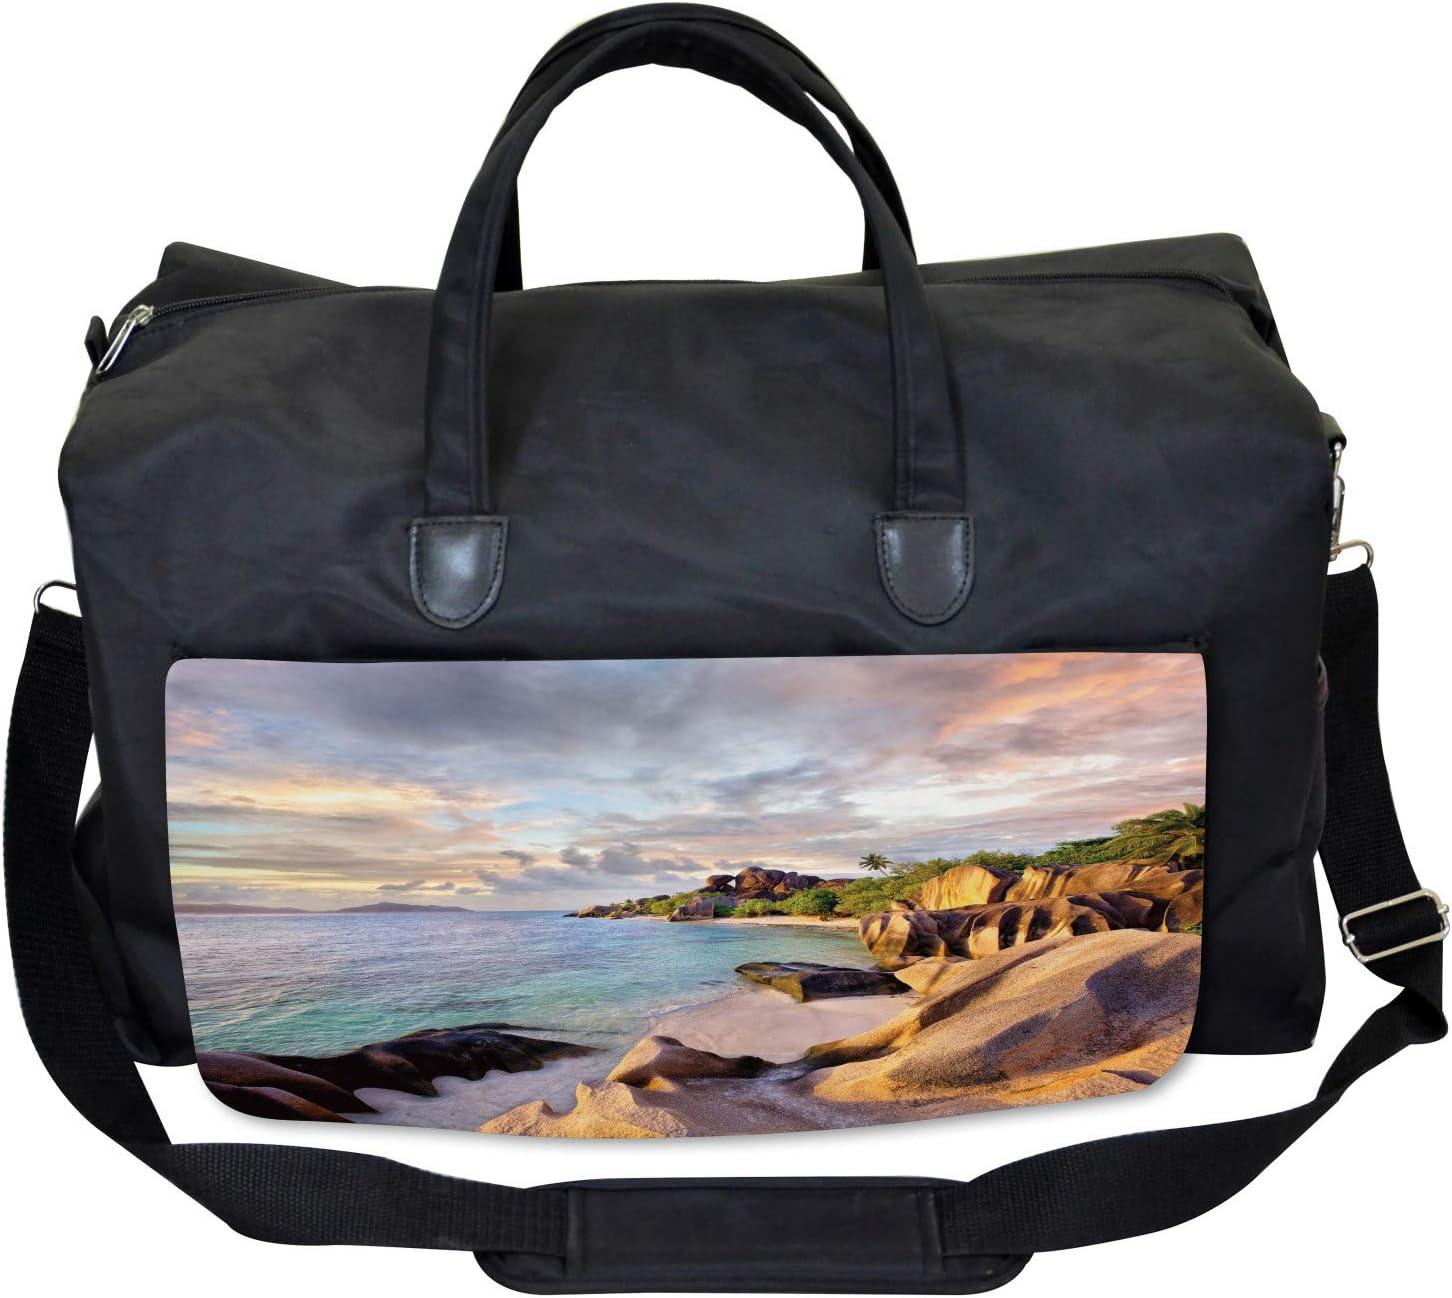 Large Weekender Carry-on Rock Sandy Beach Island Ambesonne Tropic Gym Bag